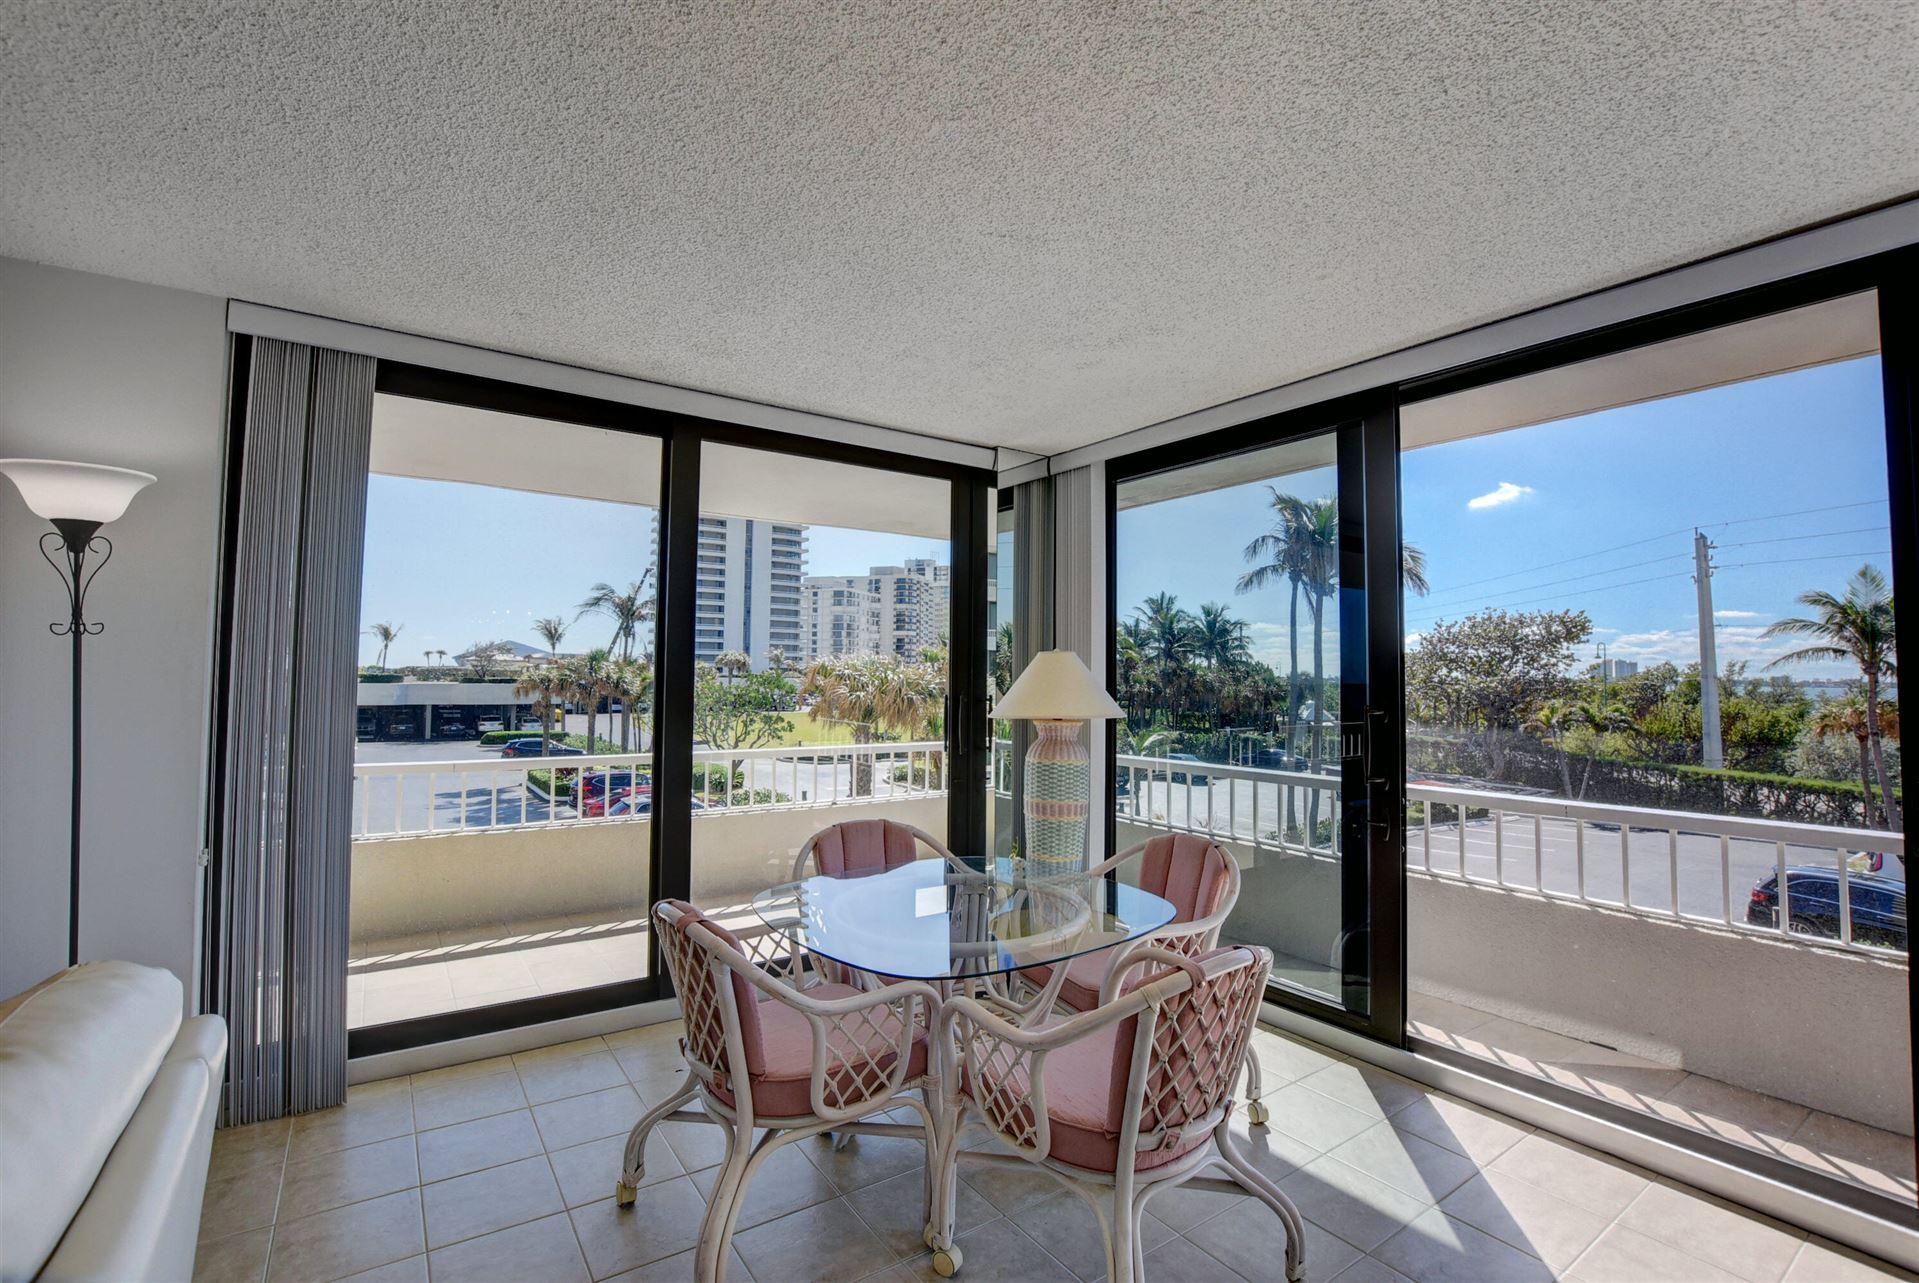 Photo of 5550 N Ocean Drive #2 B, Singer Island, FL 33404 (MLS # RX-10729785)